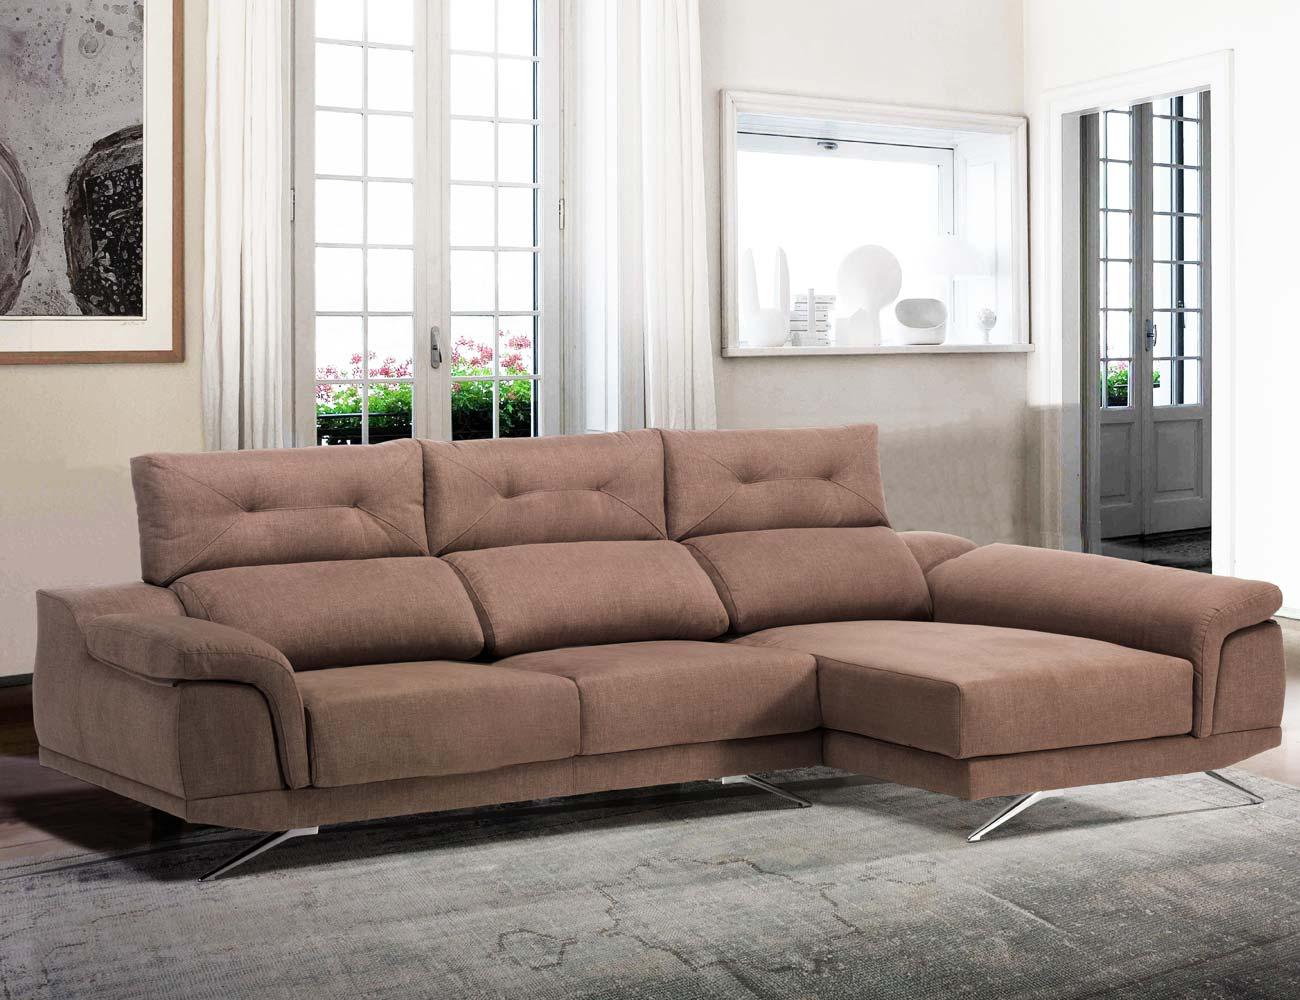 Sofa chaiselongue florencia